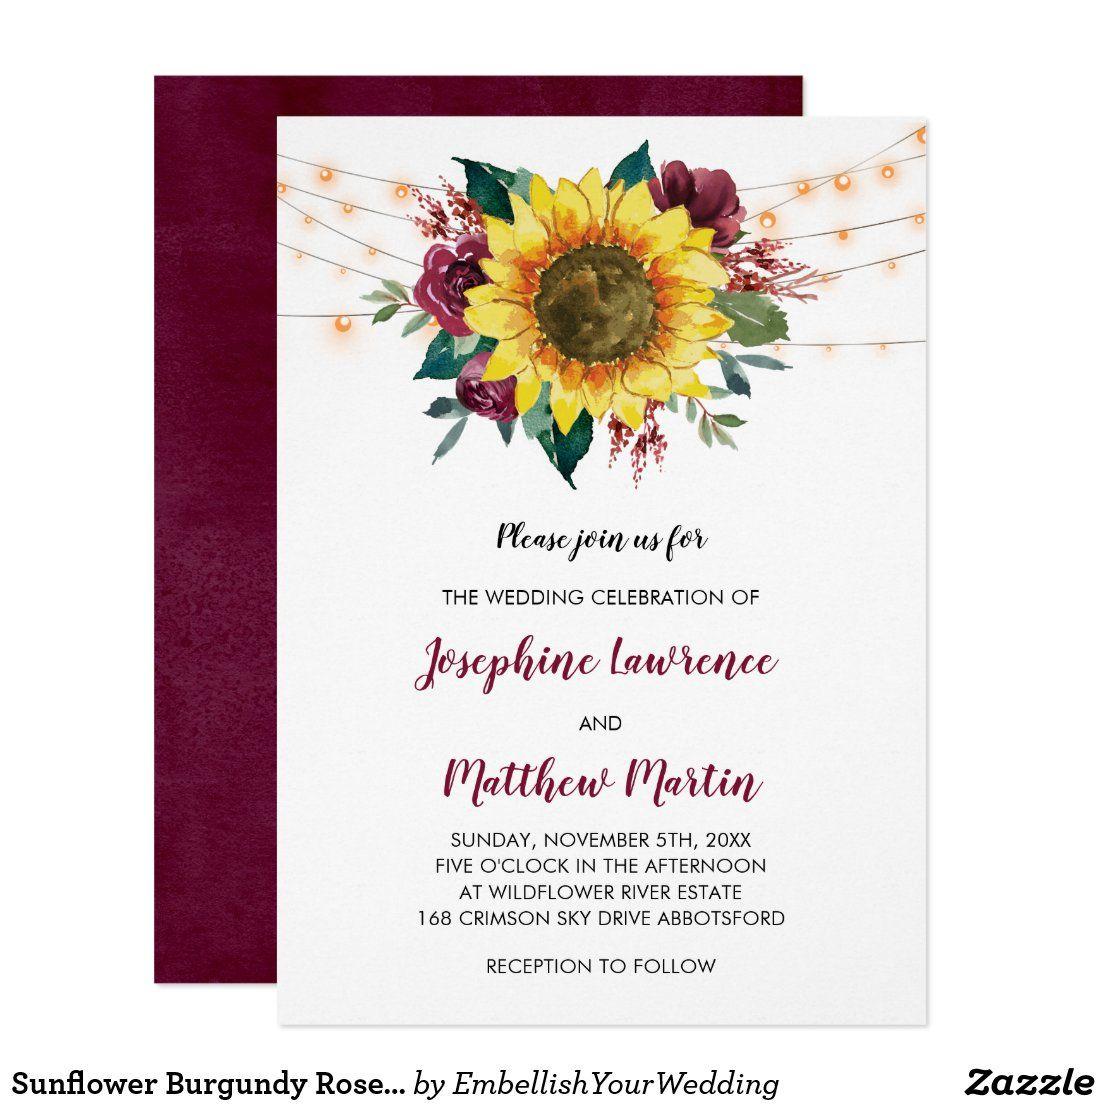 Sunflower Burgundy Rose Floral Lights Wedding Invitation